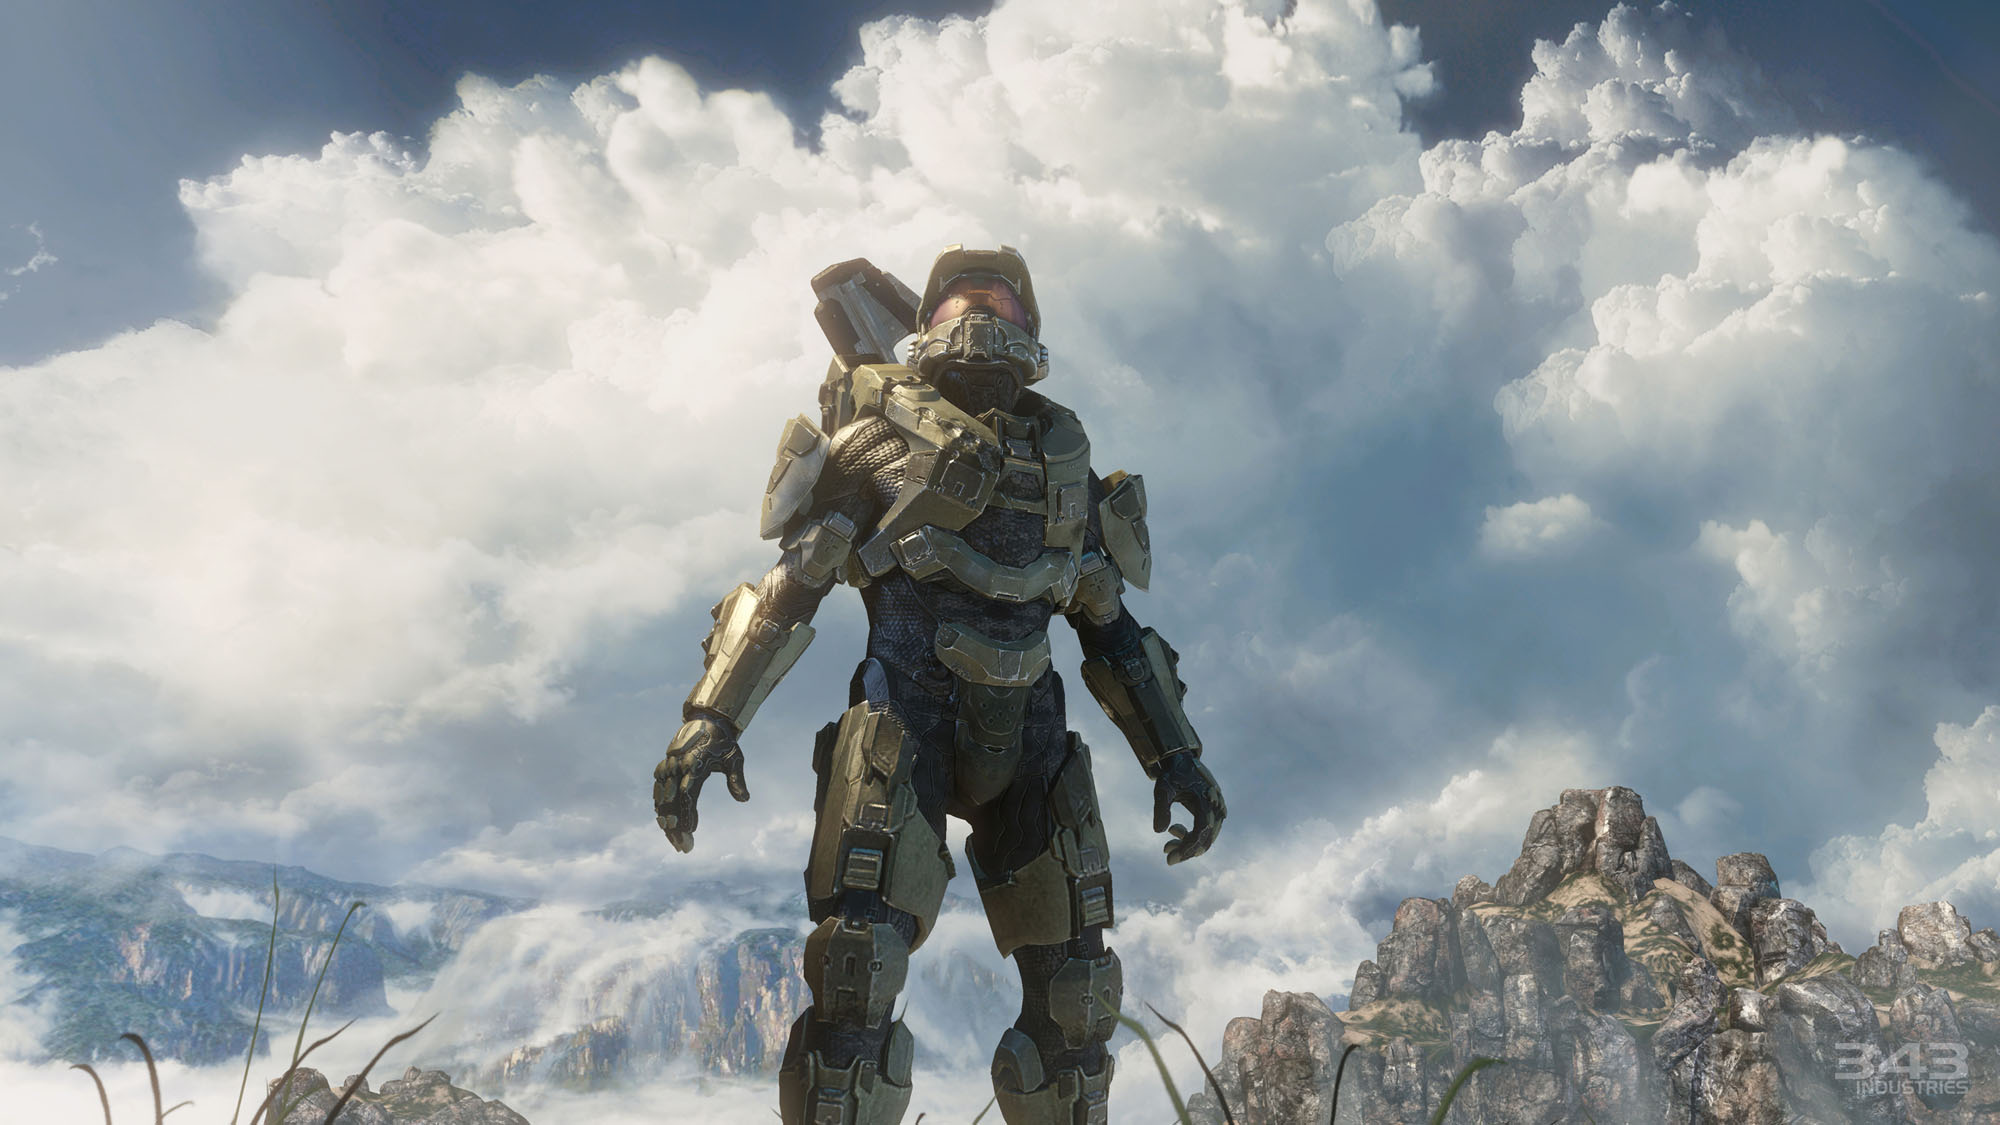 Cortana ai companion to master chief petty officer john 117 spartan